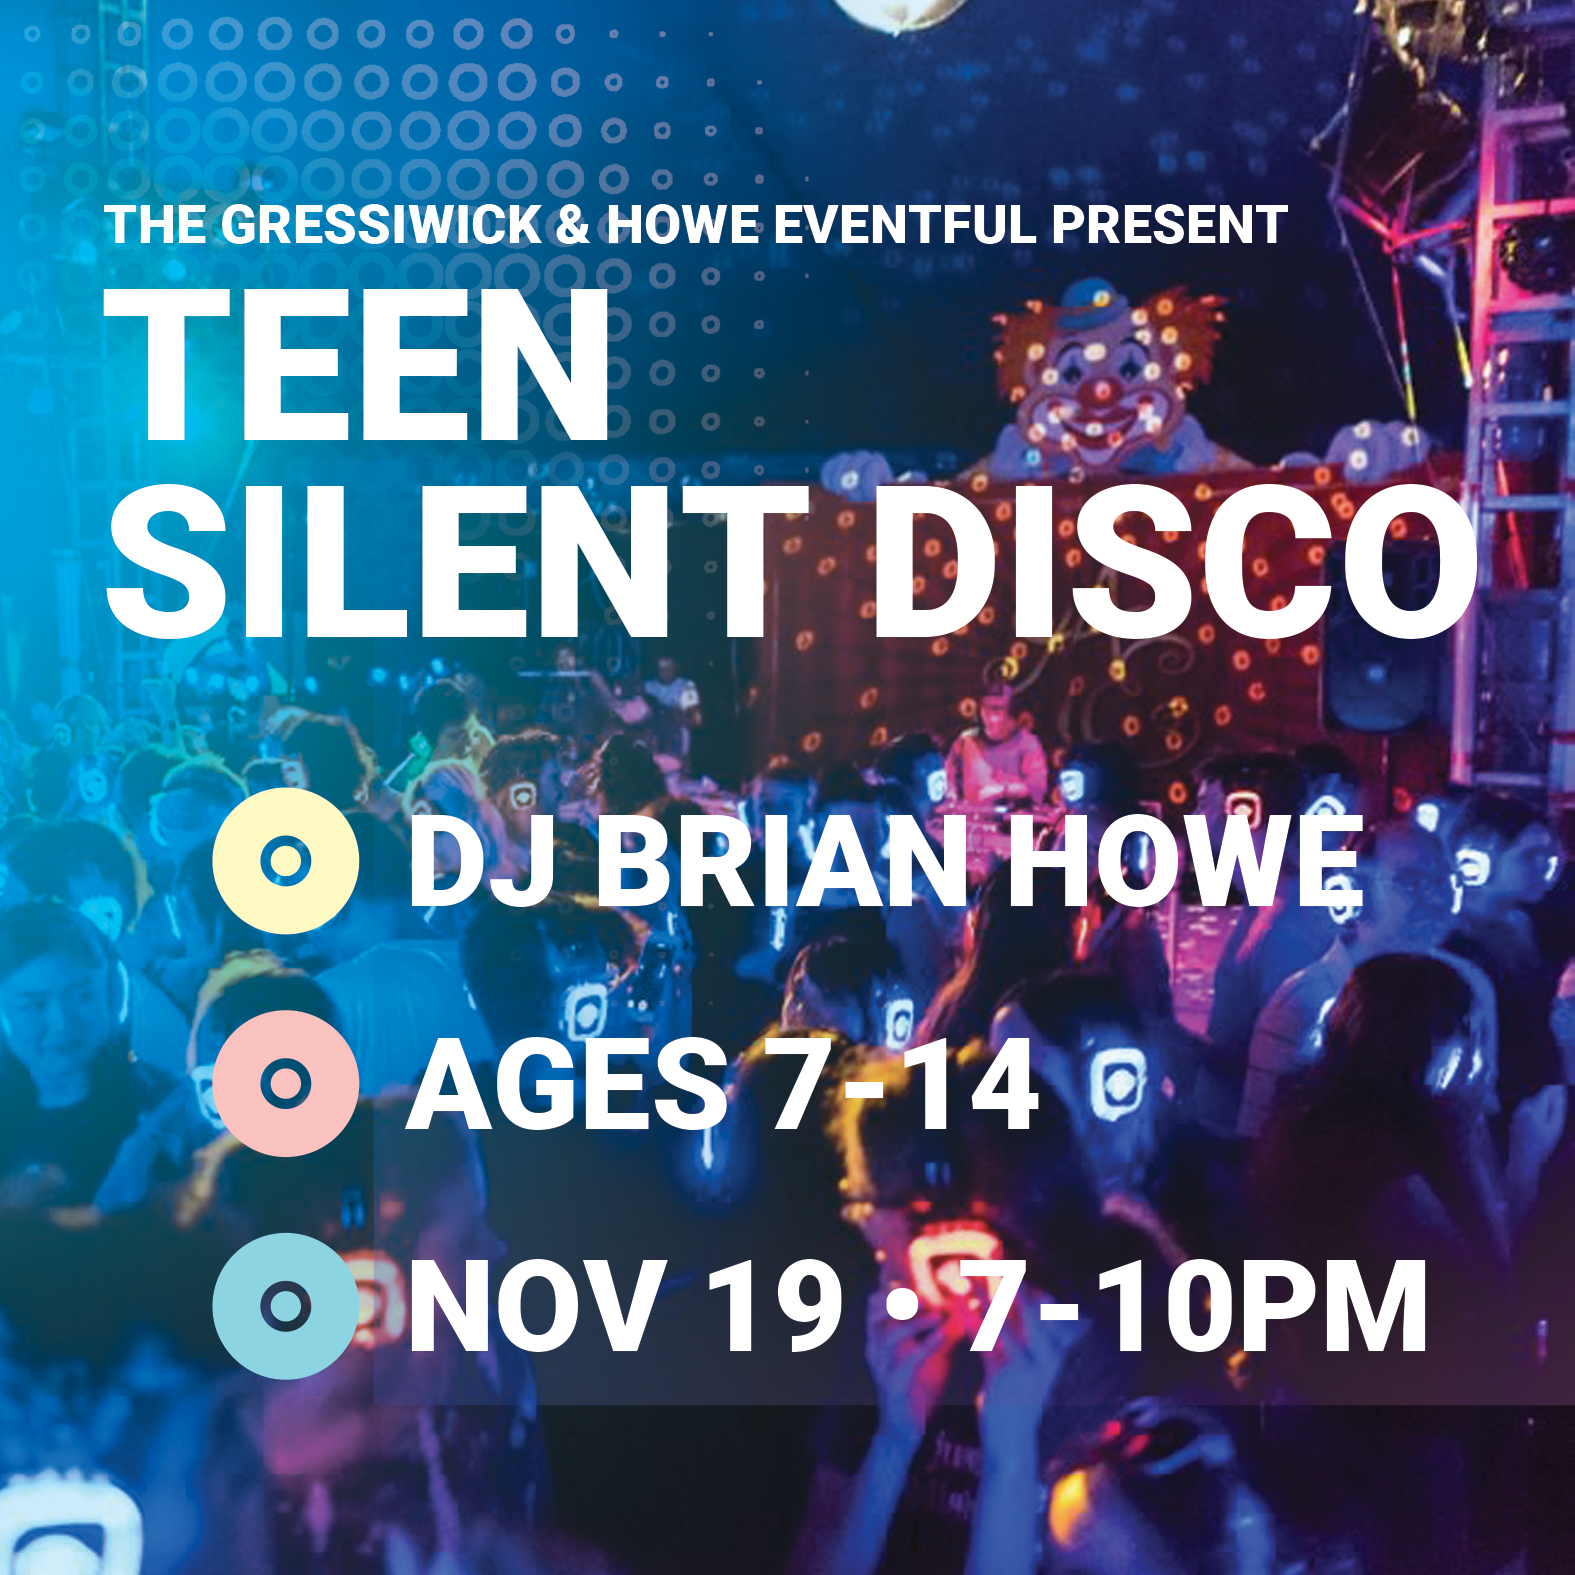 Teen Silent Disco with DJ Brian Howe